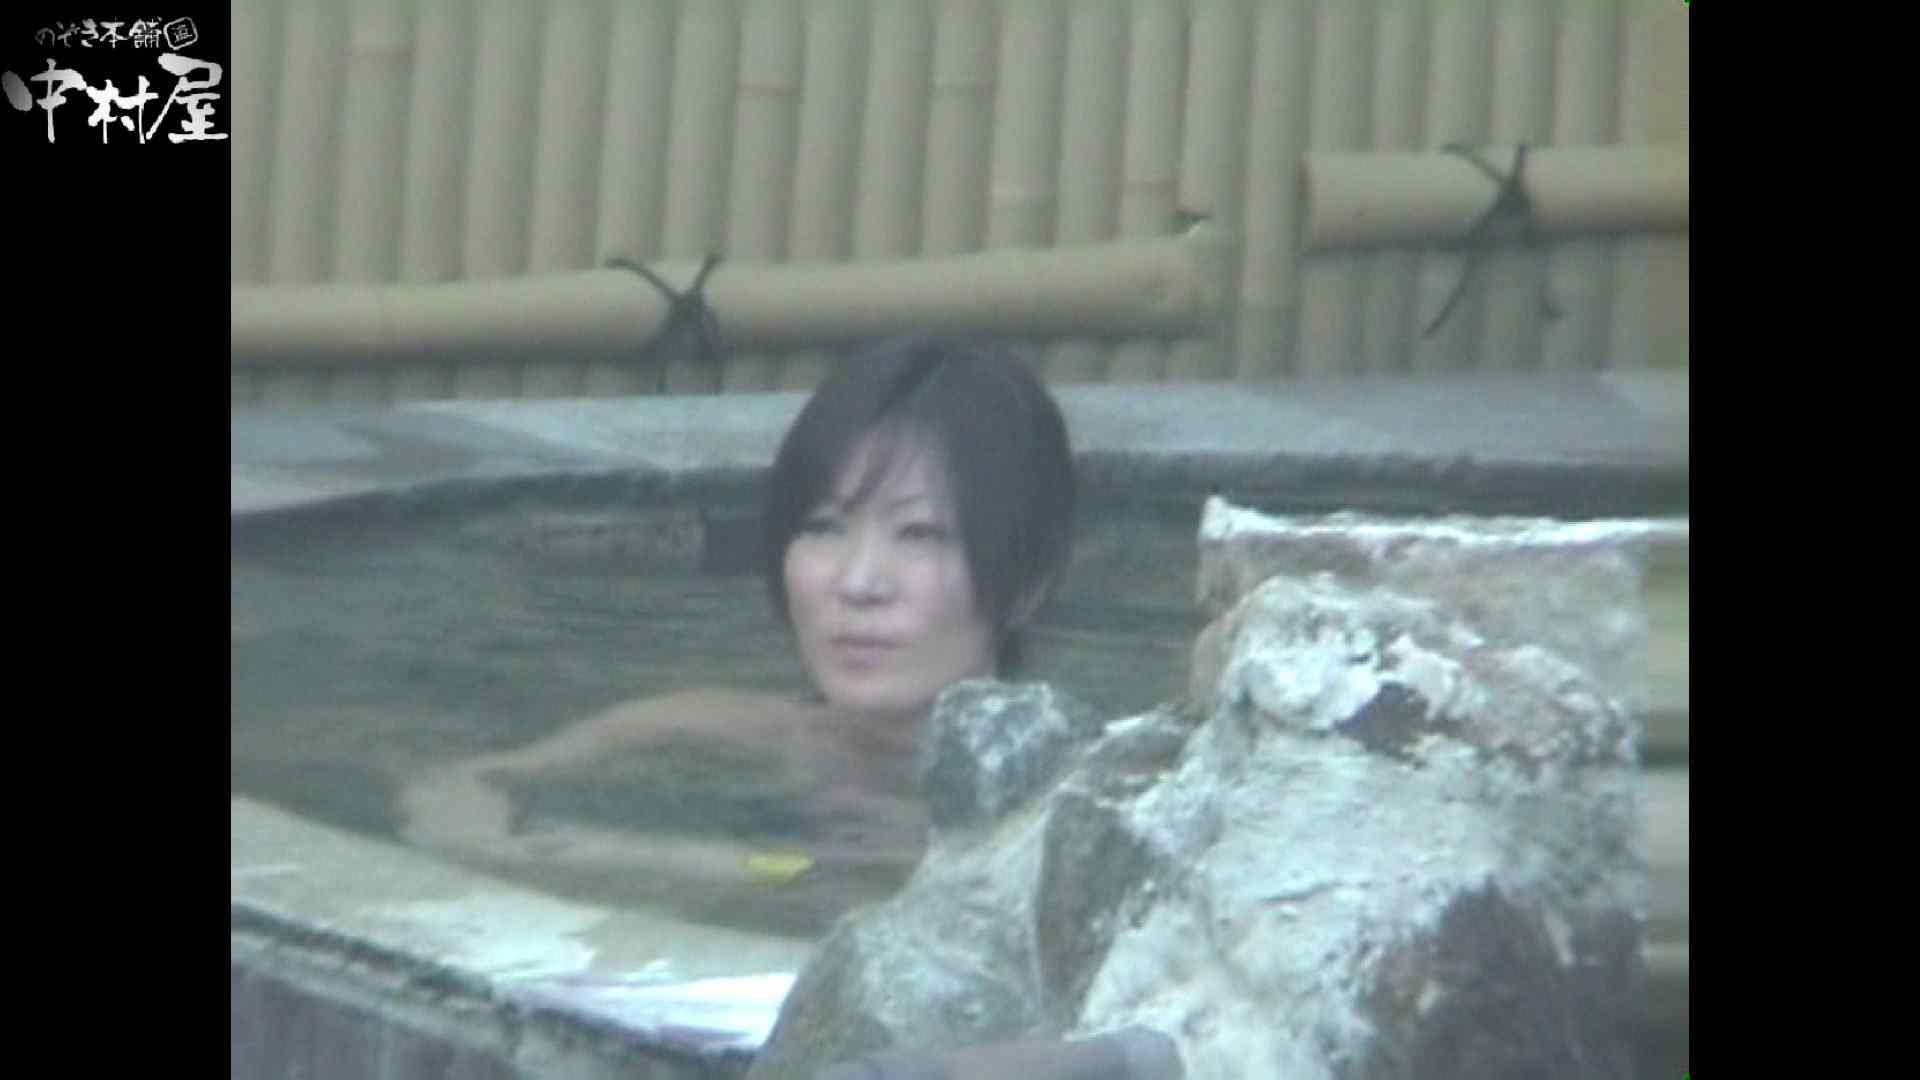 Aquaな露天風呂Vol.972 盗撮 おまんこ動画流出 80画像 5